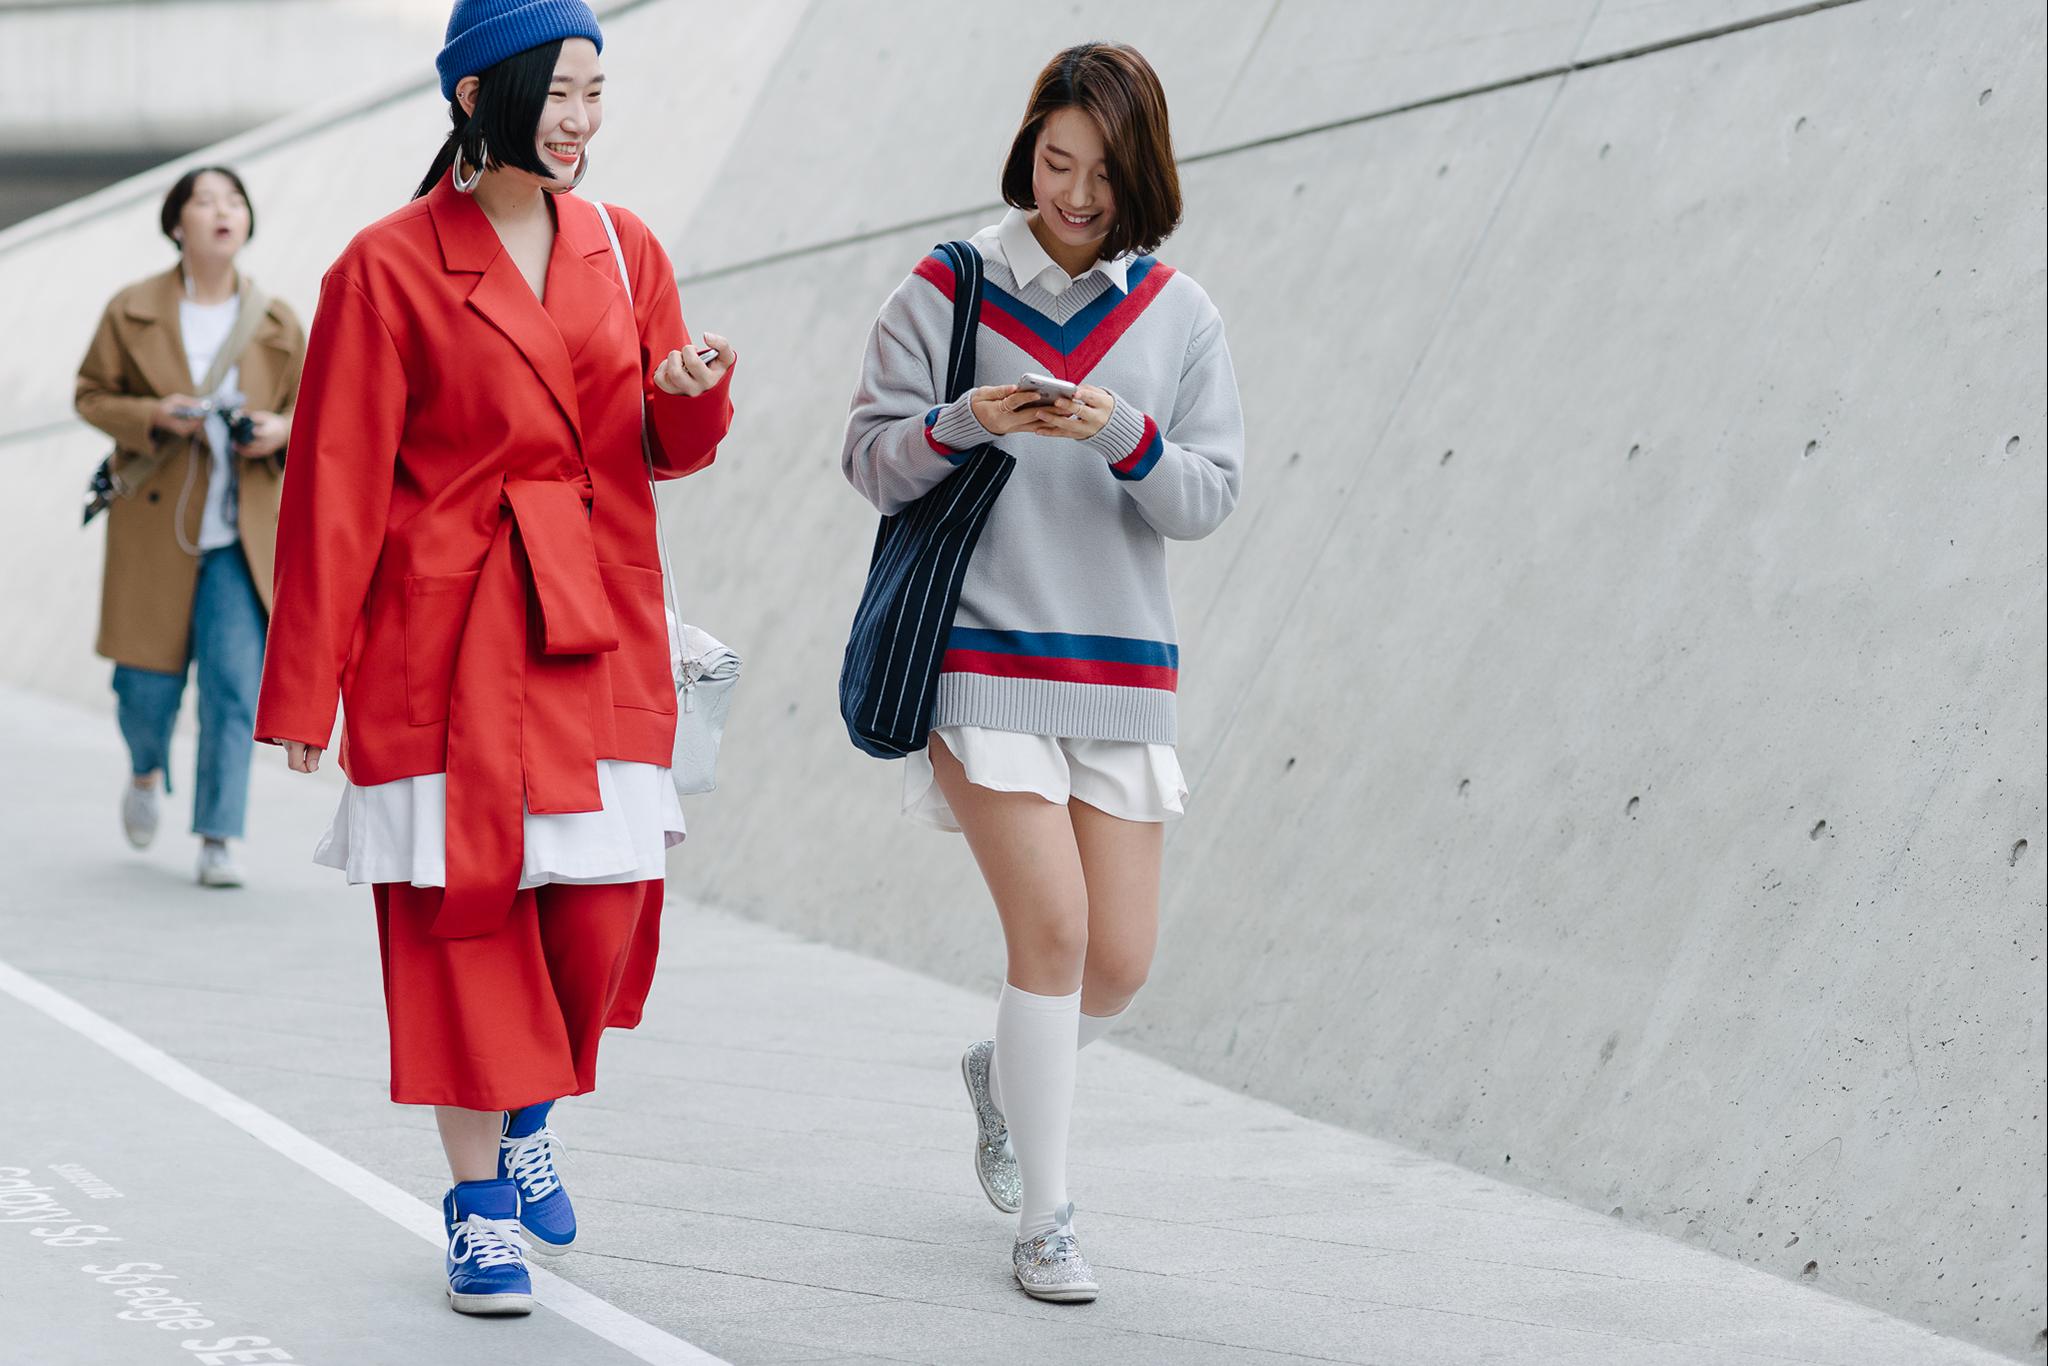 Amazing street style at seoul fashion week 2015 fashion Fashion style oktober 2015